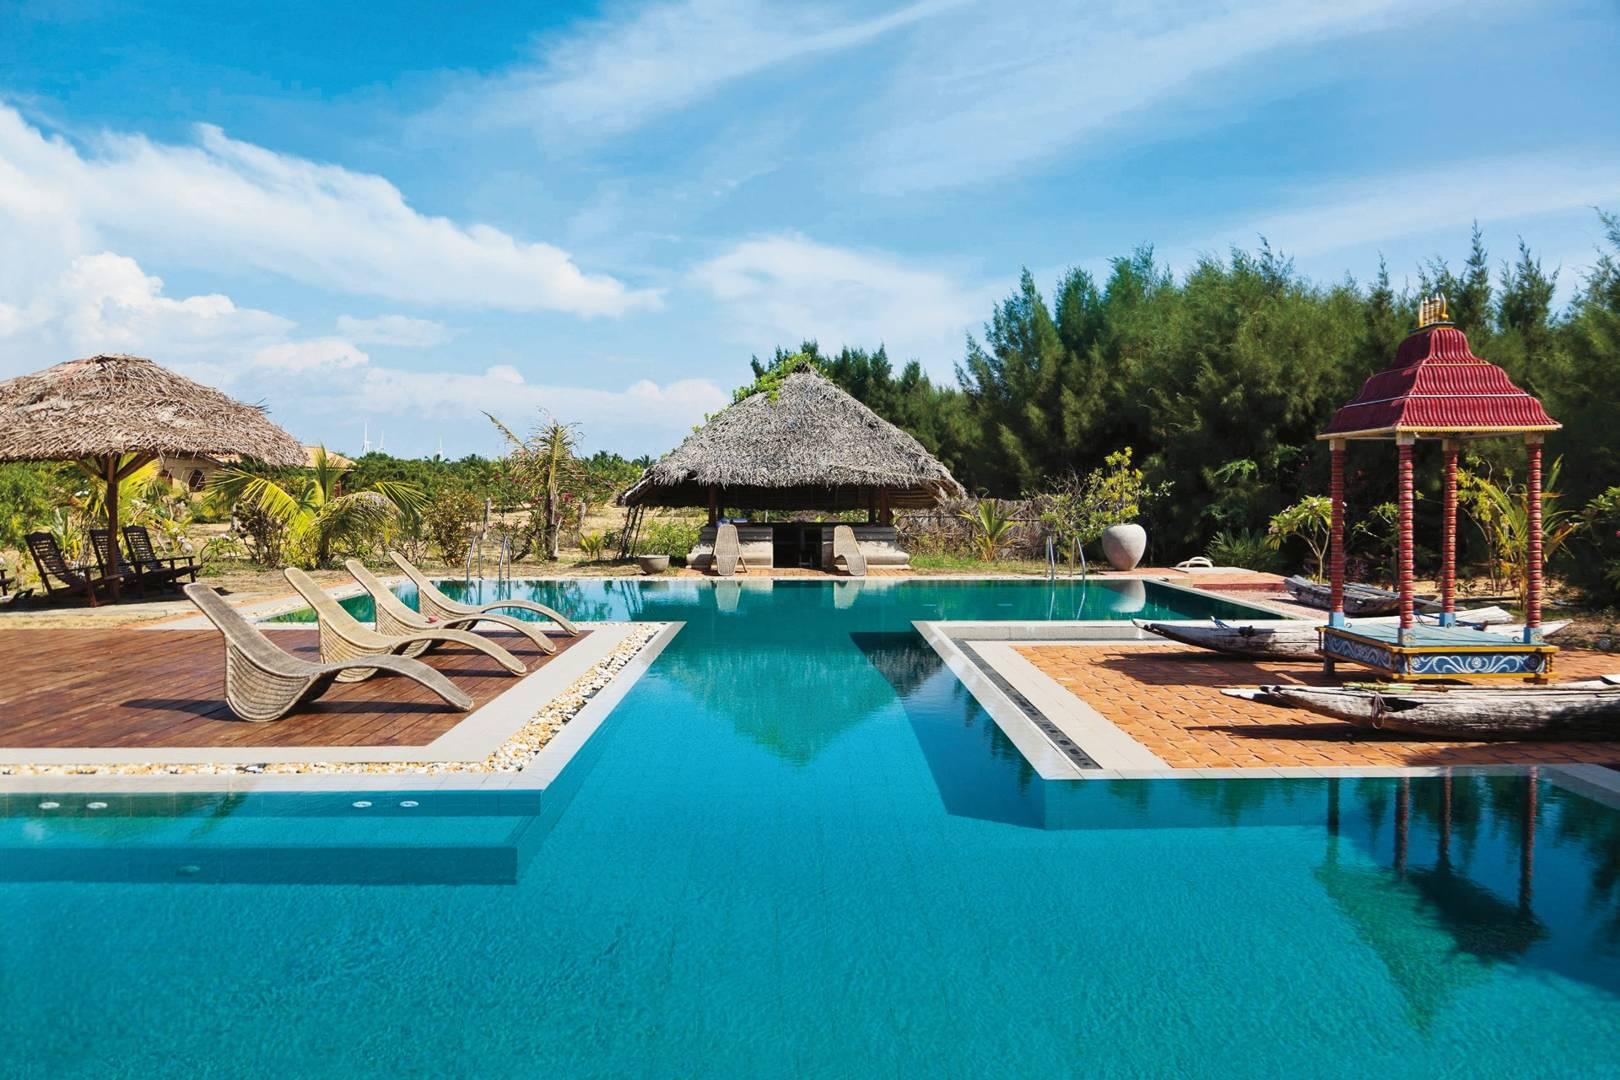 Sri Lanka Hotels 2018 World 39 S Best Hotels